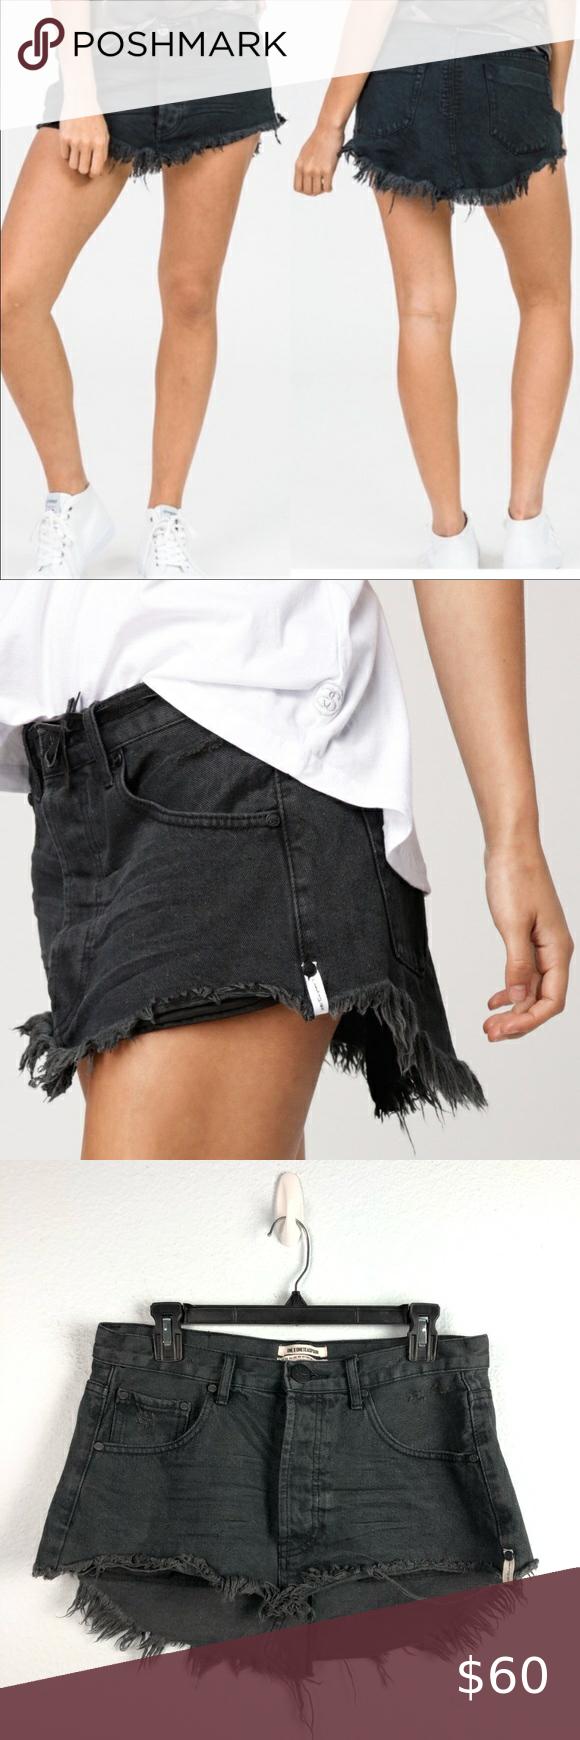 Black mini skirts size 28 Pin On My Posh Picks